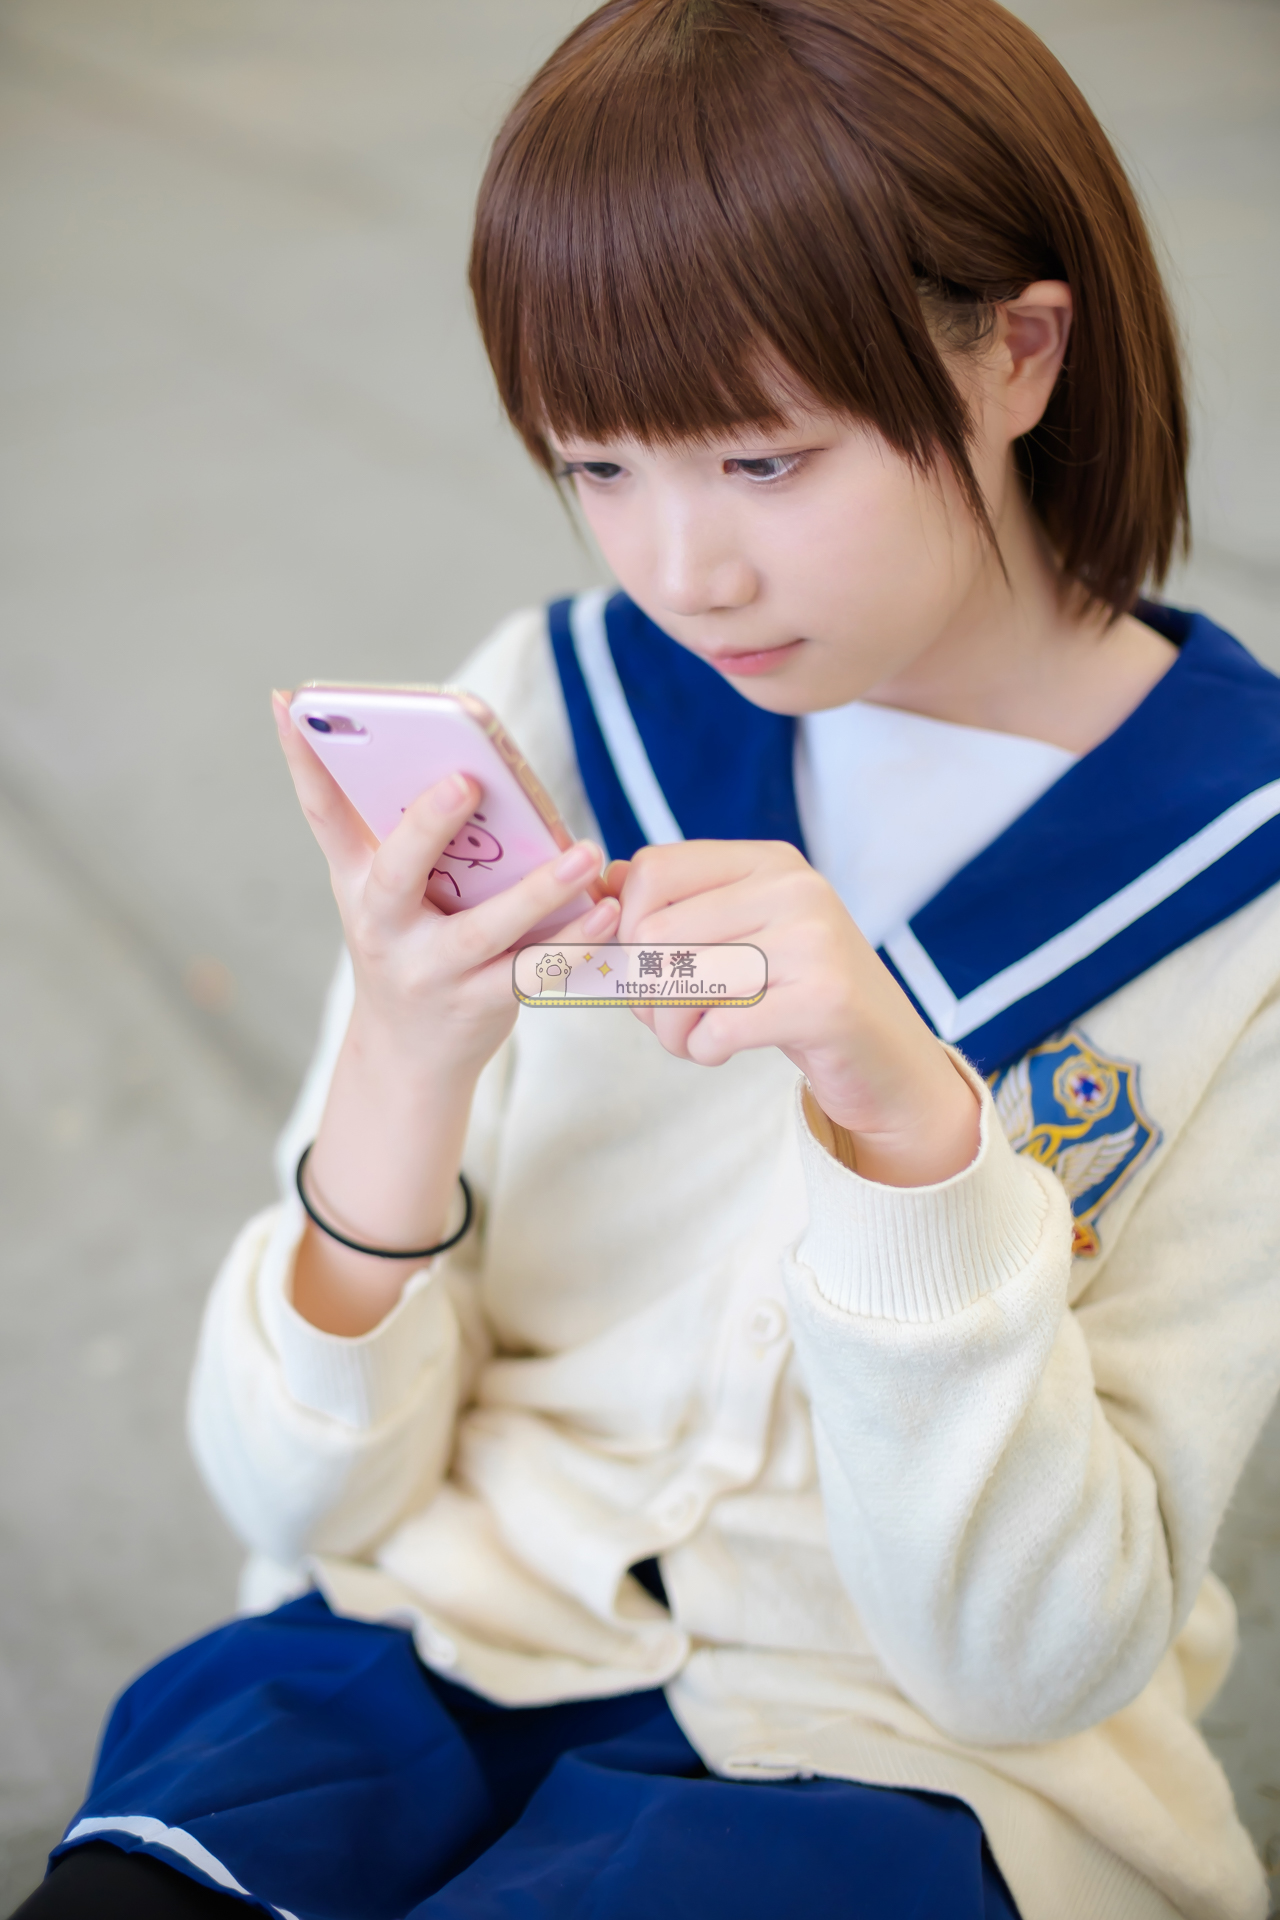 【FREE系列】森萝财团写真 FREE-004 短发俏皮女孩JK制服+黑丝室外写真 [24图-0视频-161MB] FREE系列 第4张